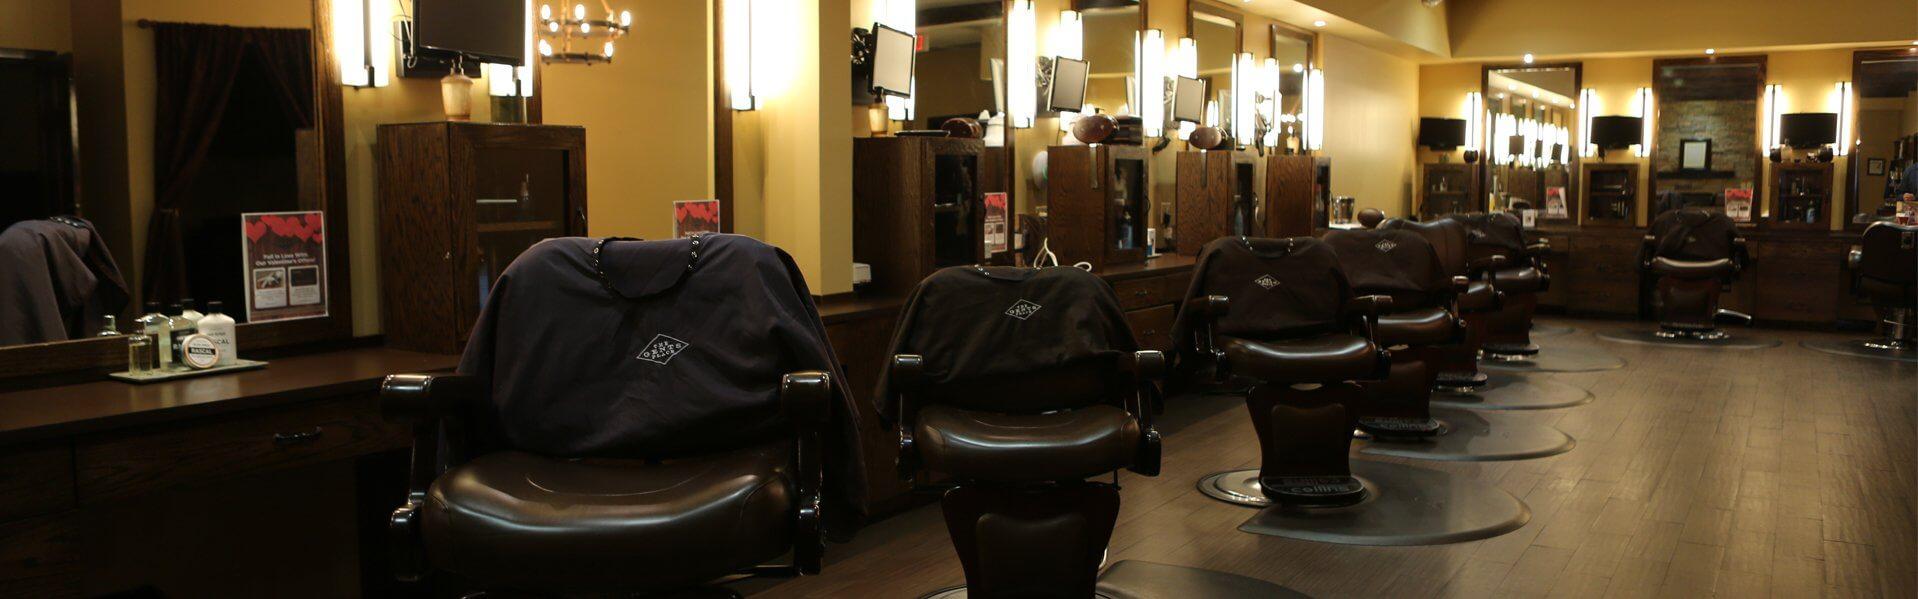 Men S Haircuts Bentonville Upscale Barbershop The Gents Place